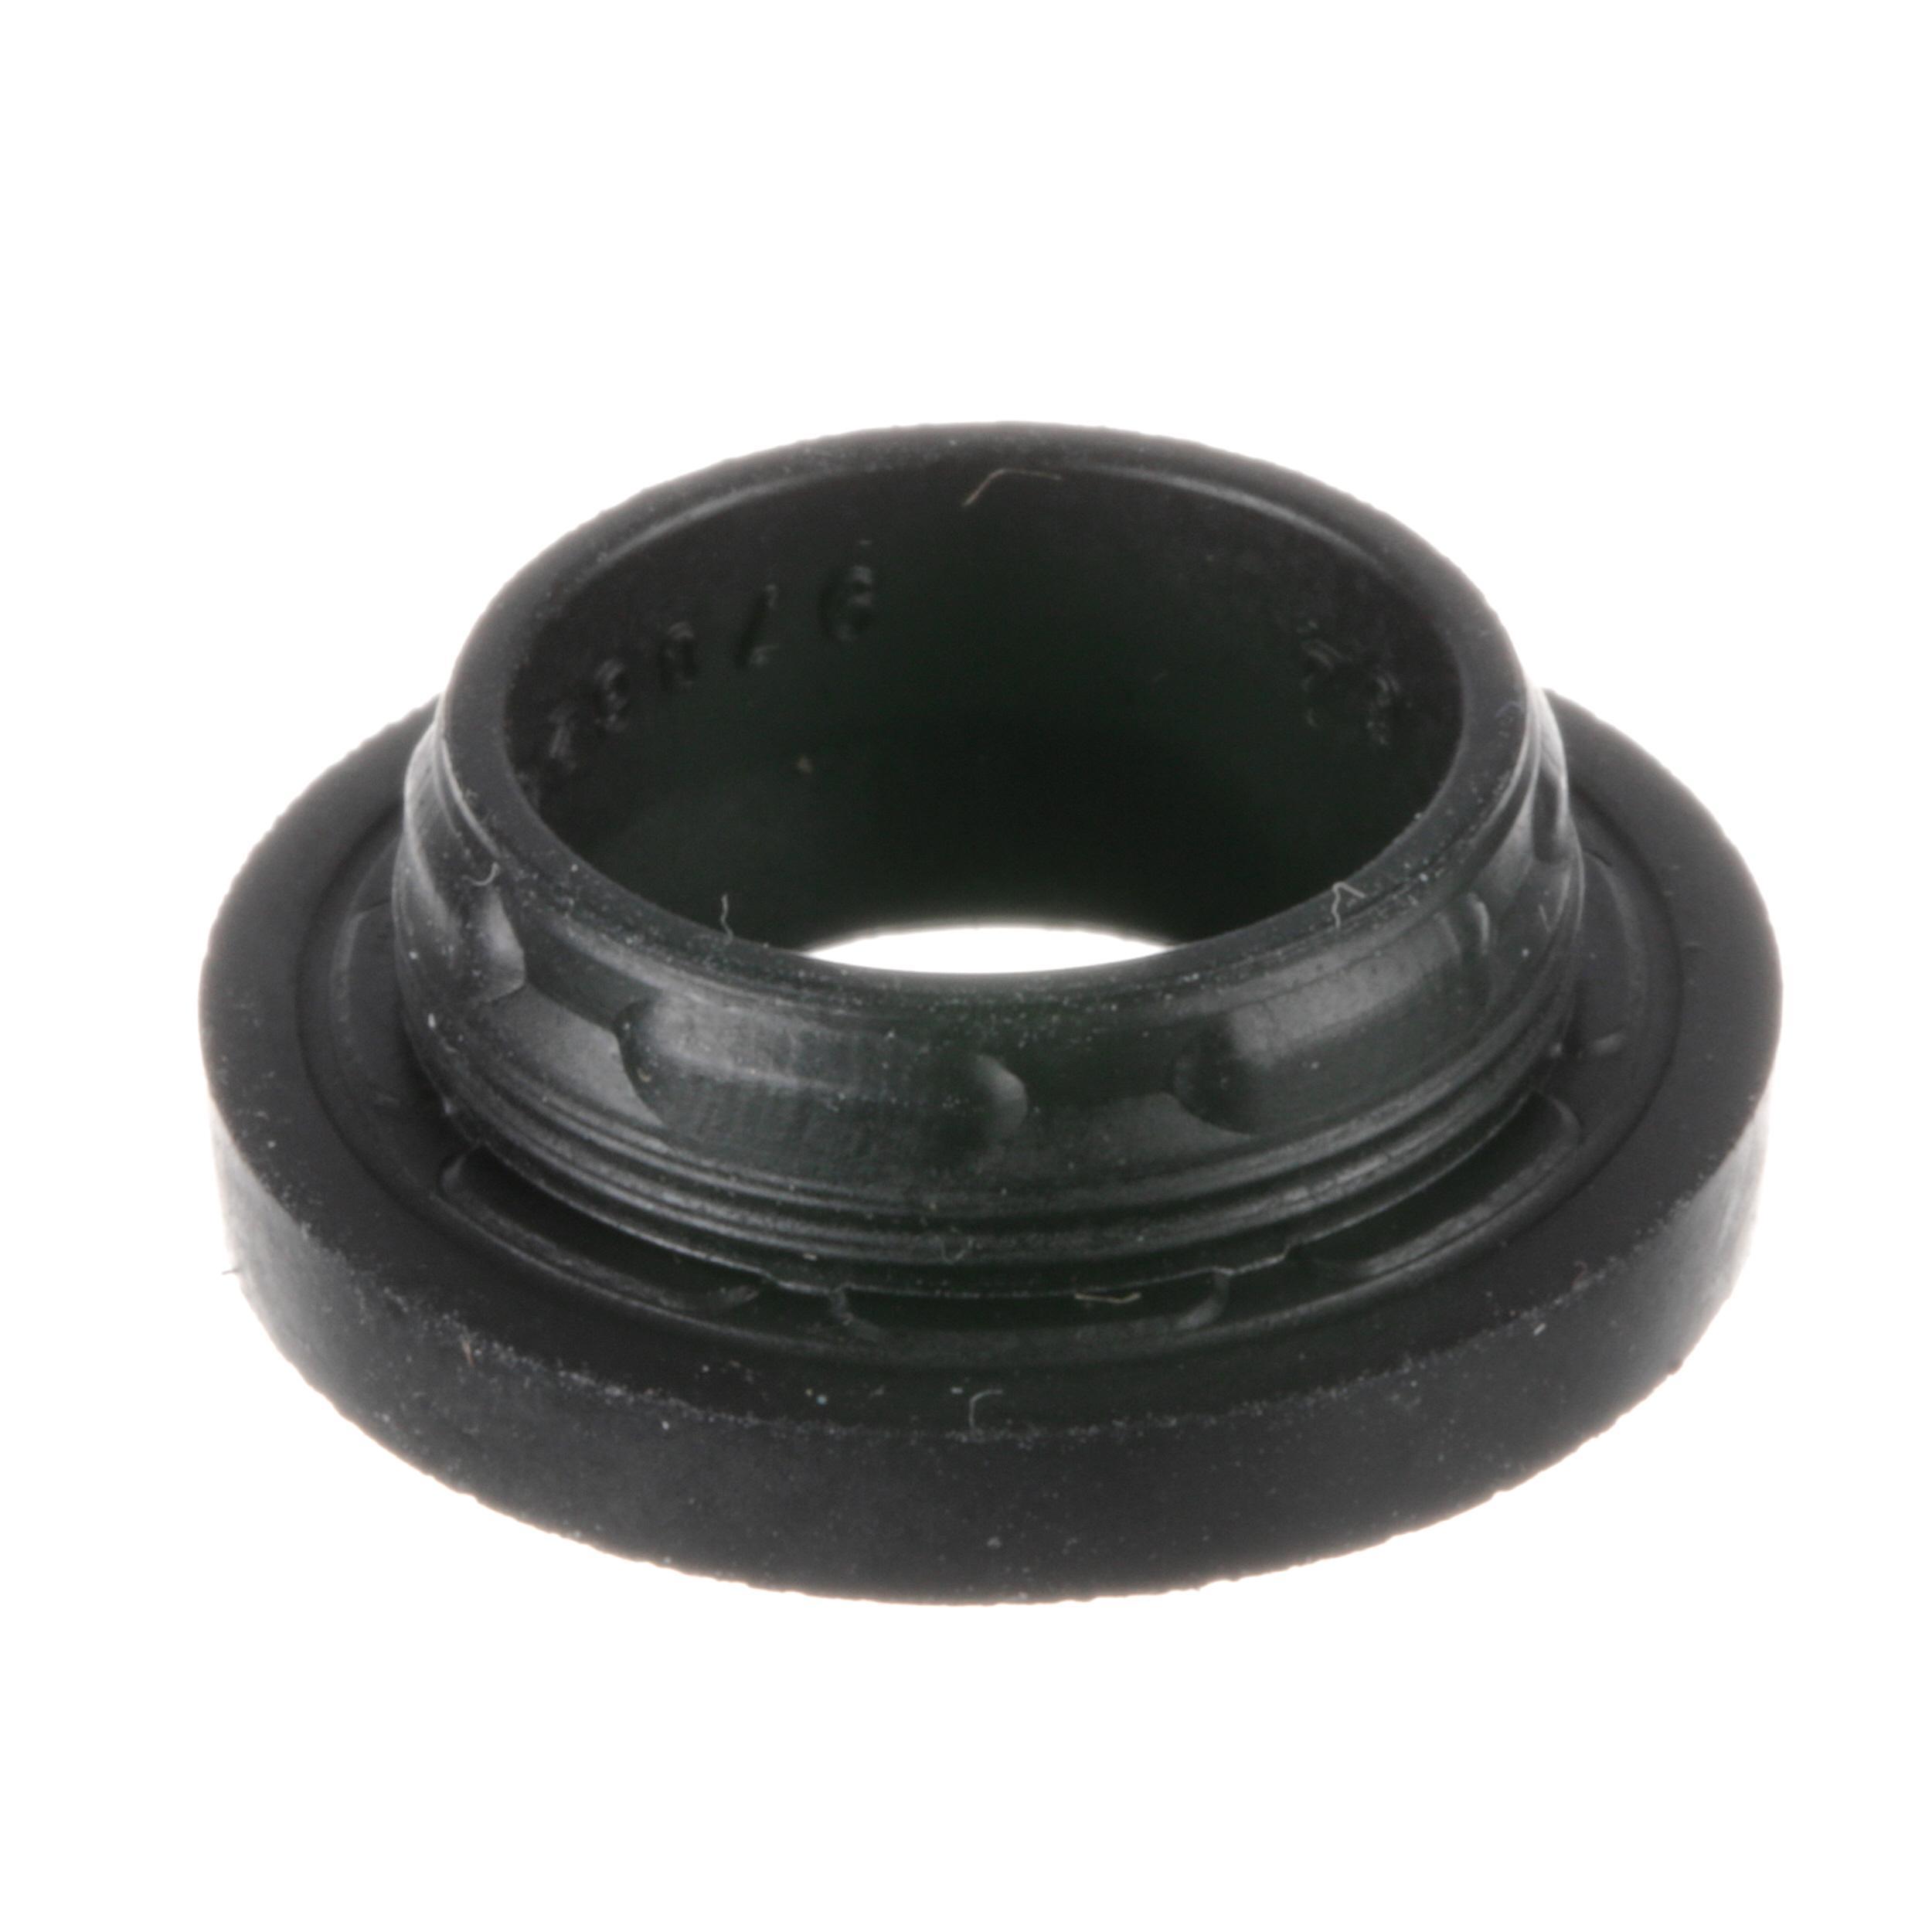 Kitchenaid Seal Motor Shaft Part 9706247